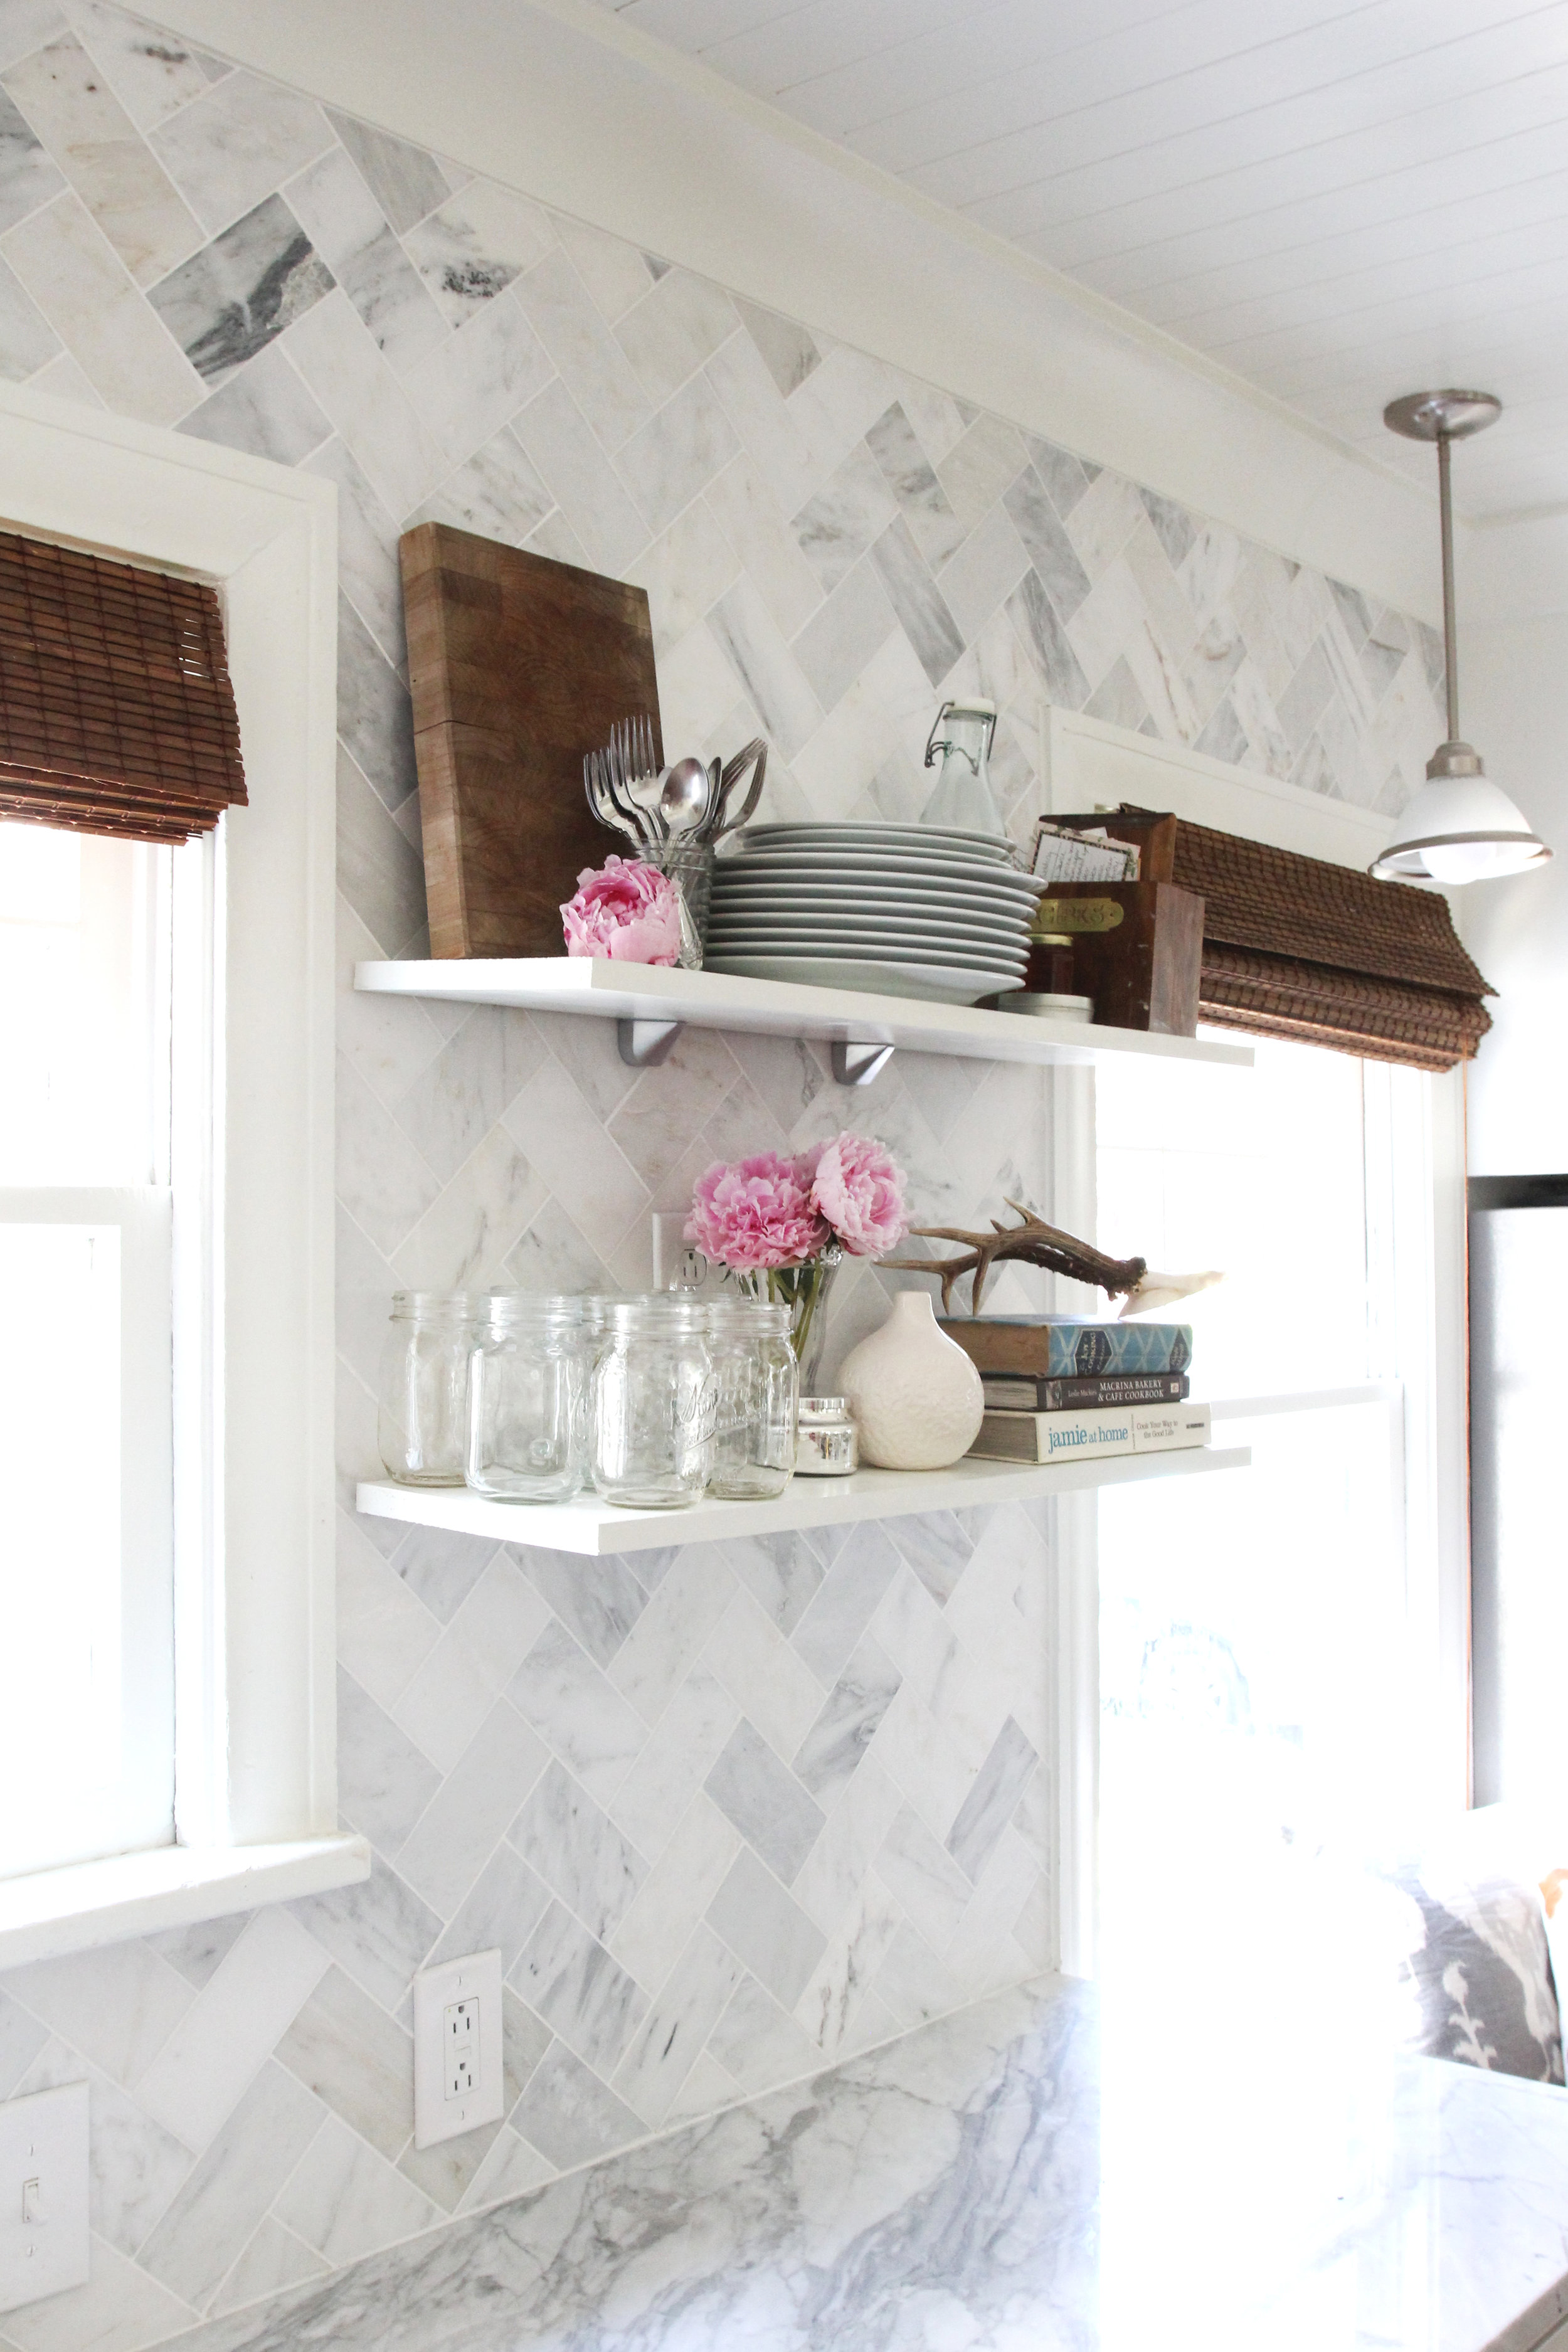 The Grit and Polish - Ravenna Kitchen Open Shelves Styling 3.jpg